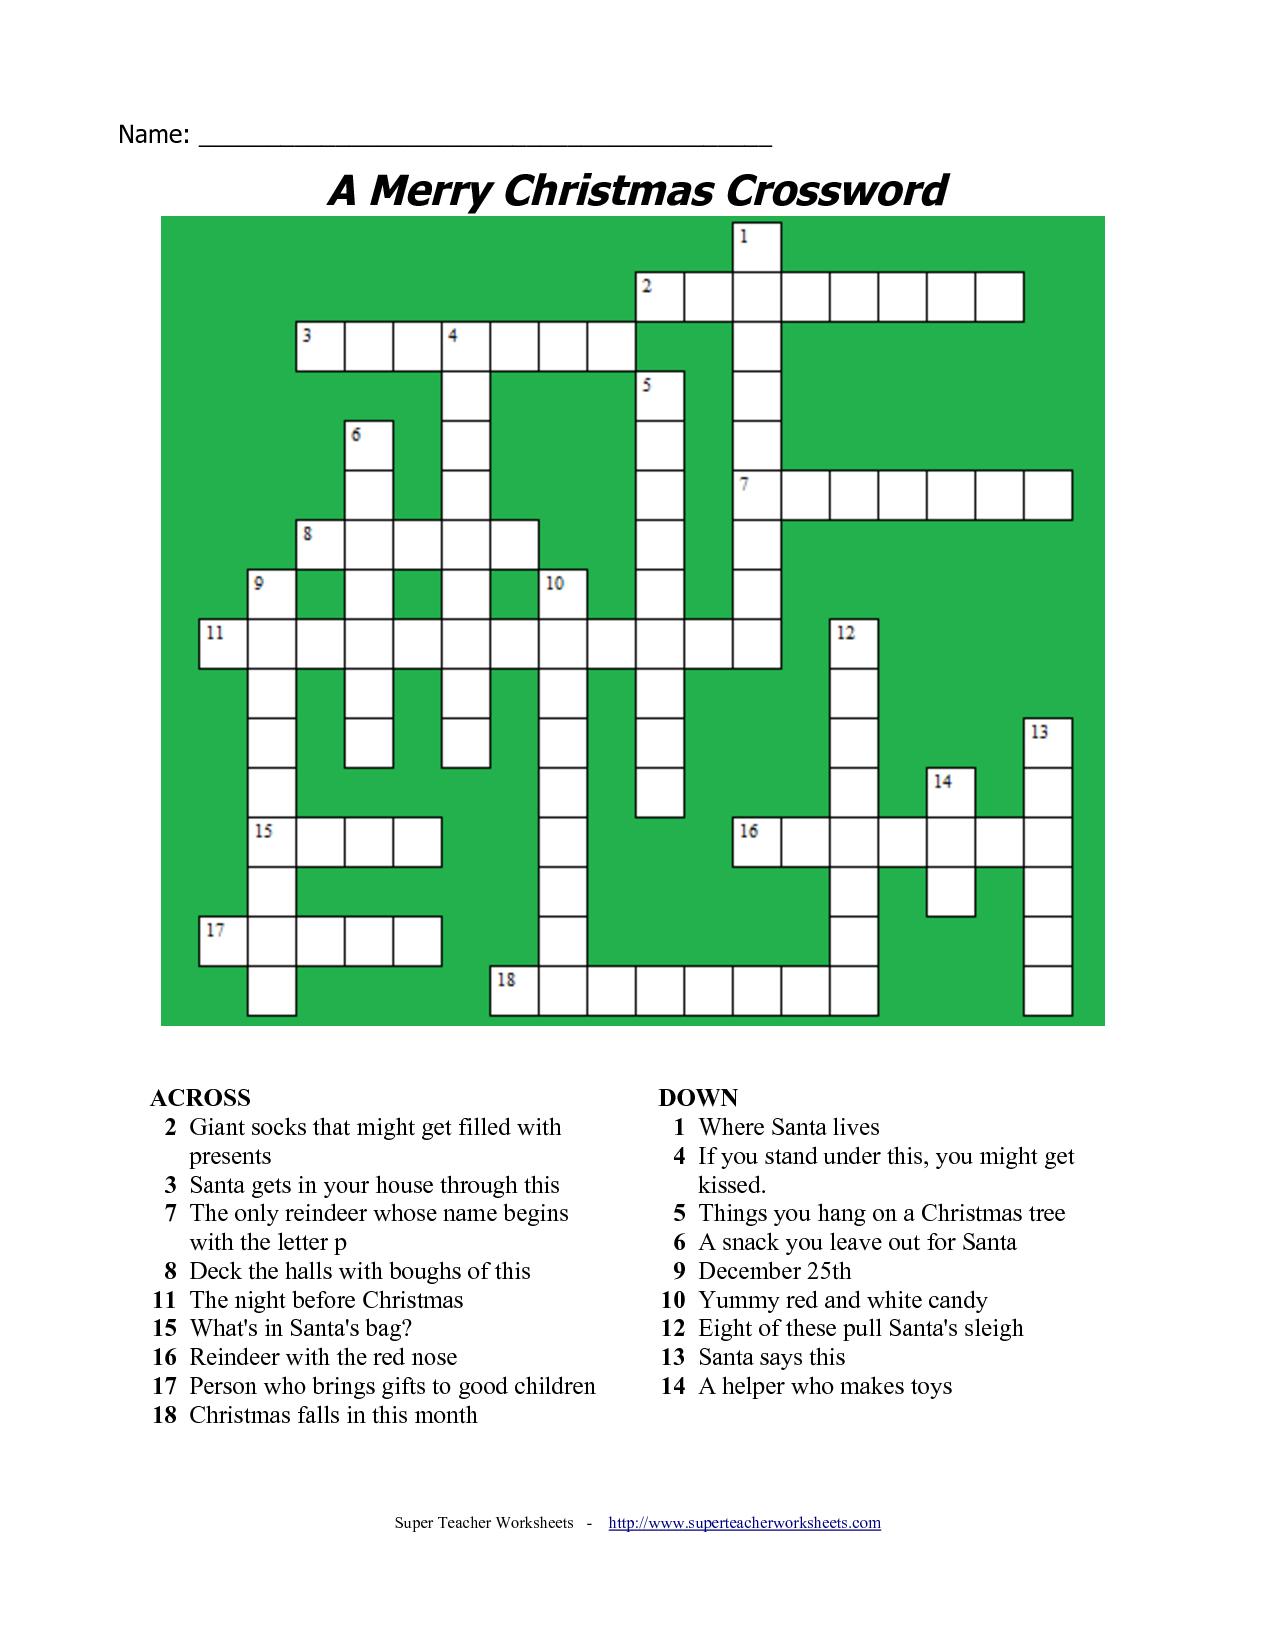 20 Fun Printable Christmas Crossword Puzzles | Kittybabylove - Christmas Crossword Puzzle Printable With Answers